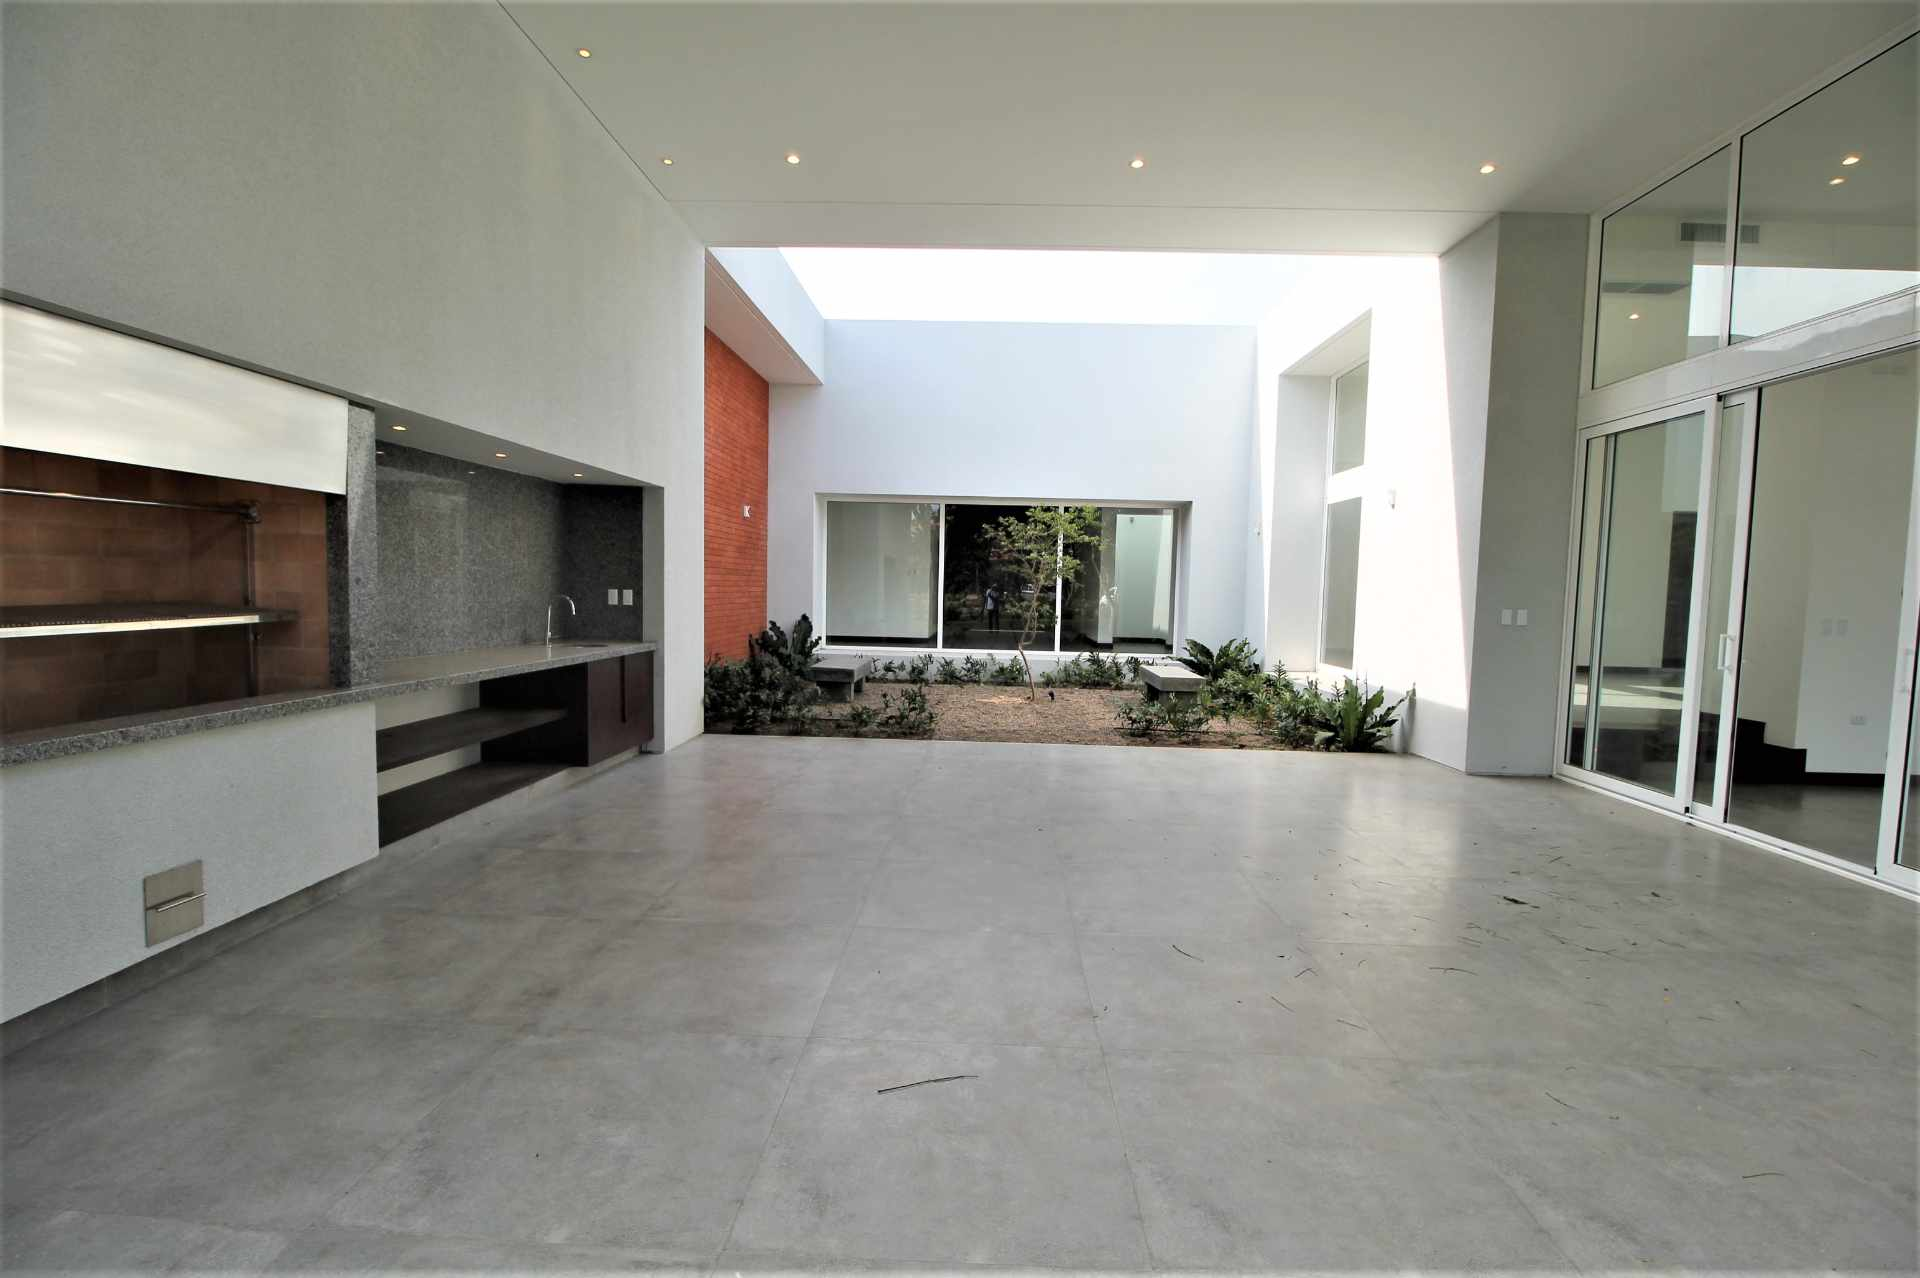 Casa en Alquiler Av. Pirai 5to Anillo - Condominio Cerrado Foto 5